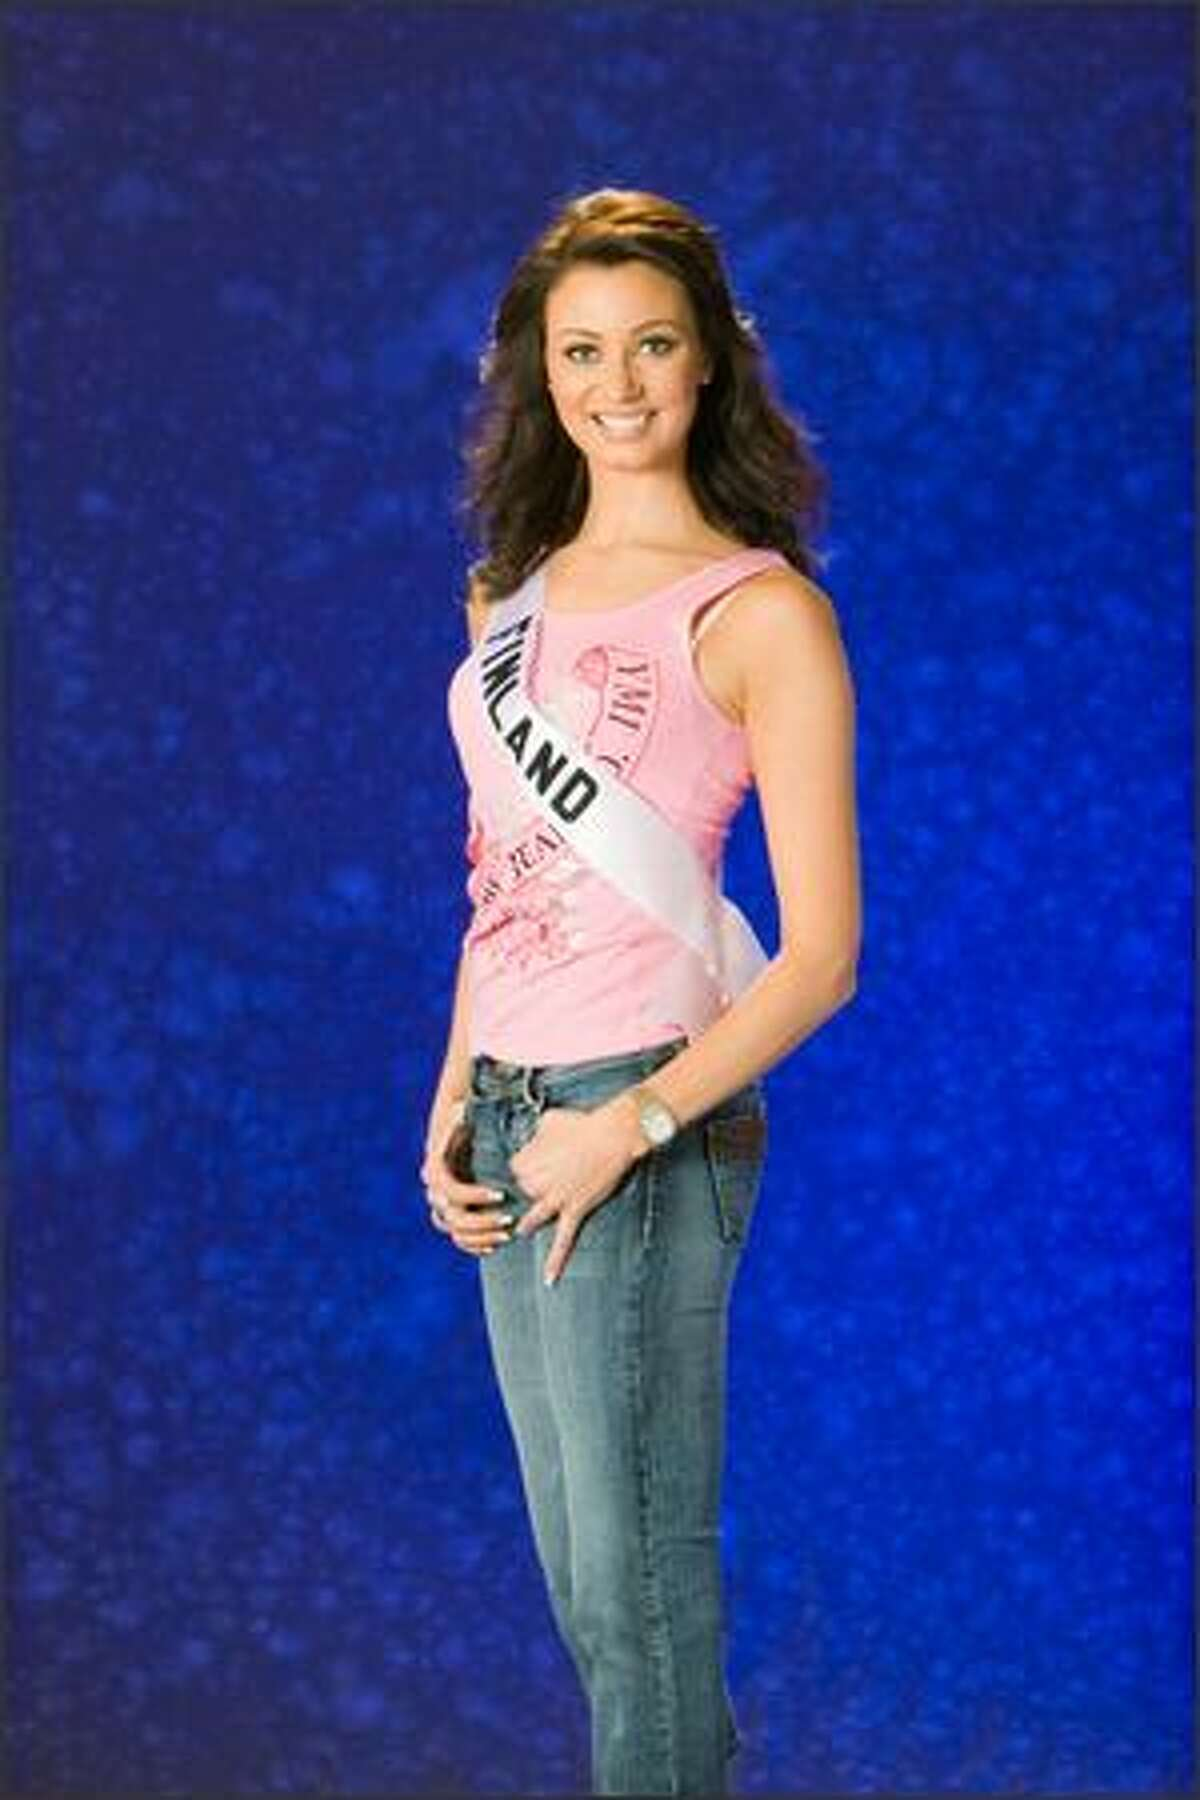 Noora Hautakangas, Miss Finland 2007.